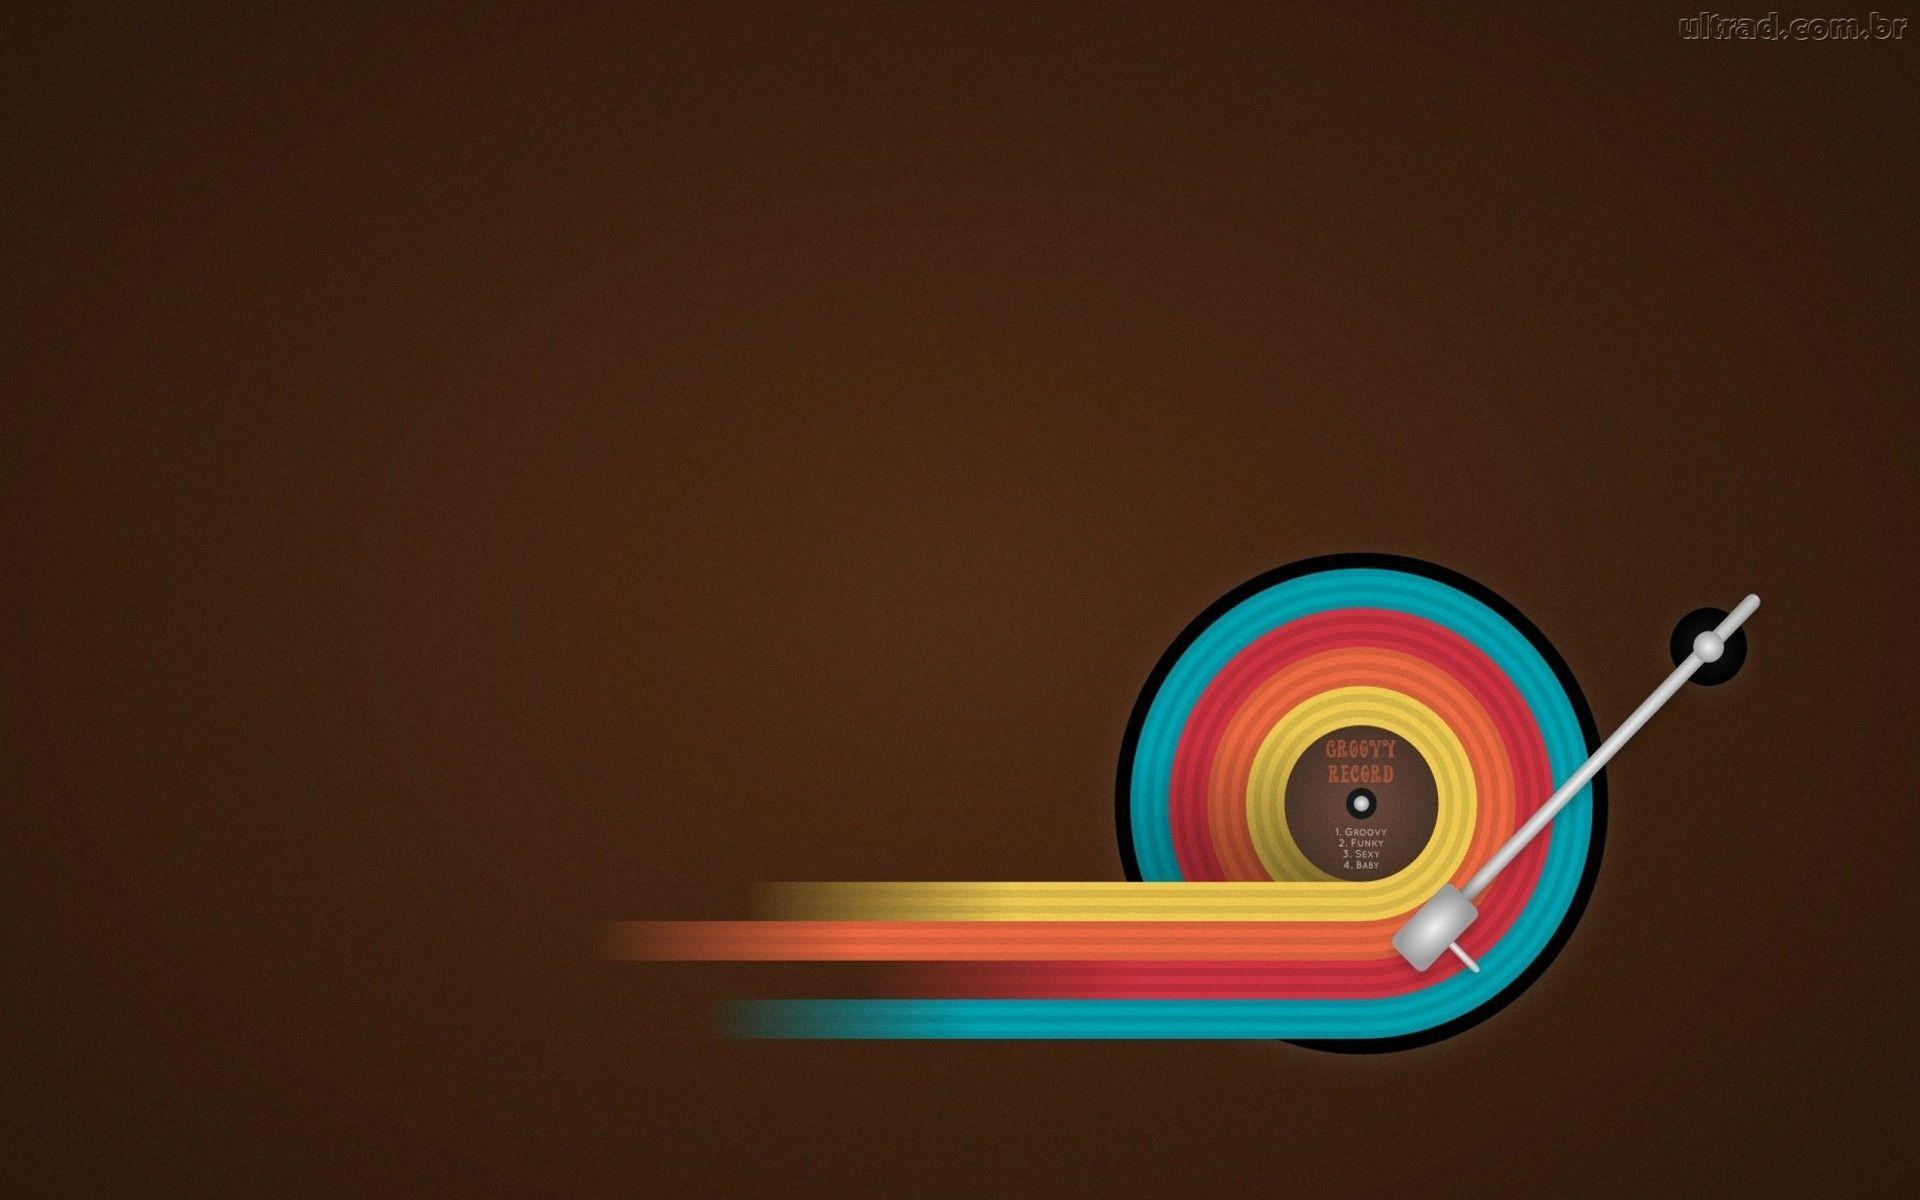 276100 Papel De Parede Musica Saindo Do Disco De Vinil 1920x1200 Jpg 1920 1200 Music Wallpaper Wallpaper Music Themed